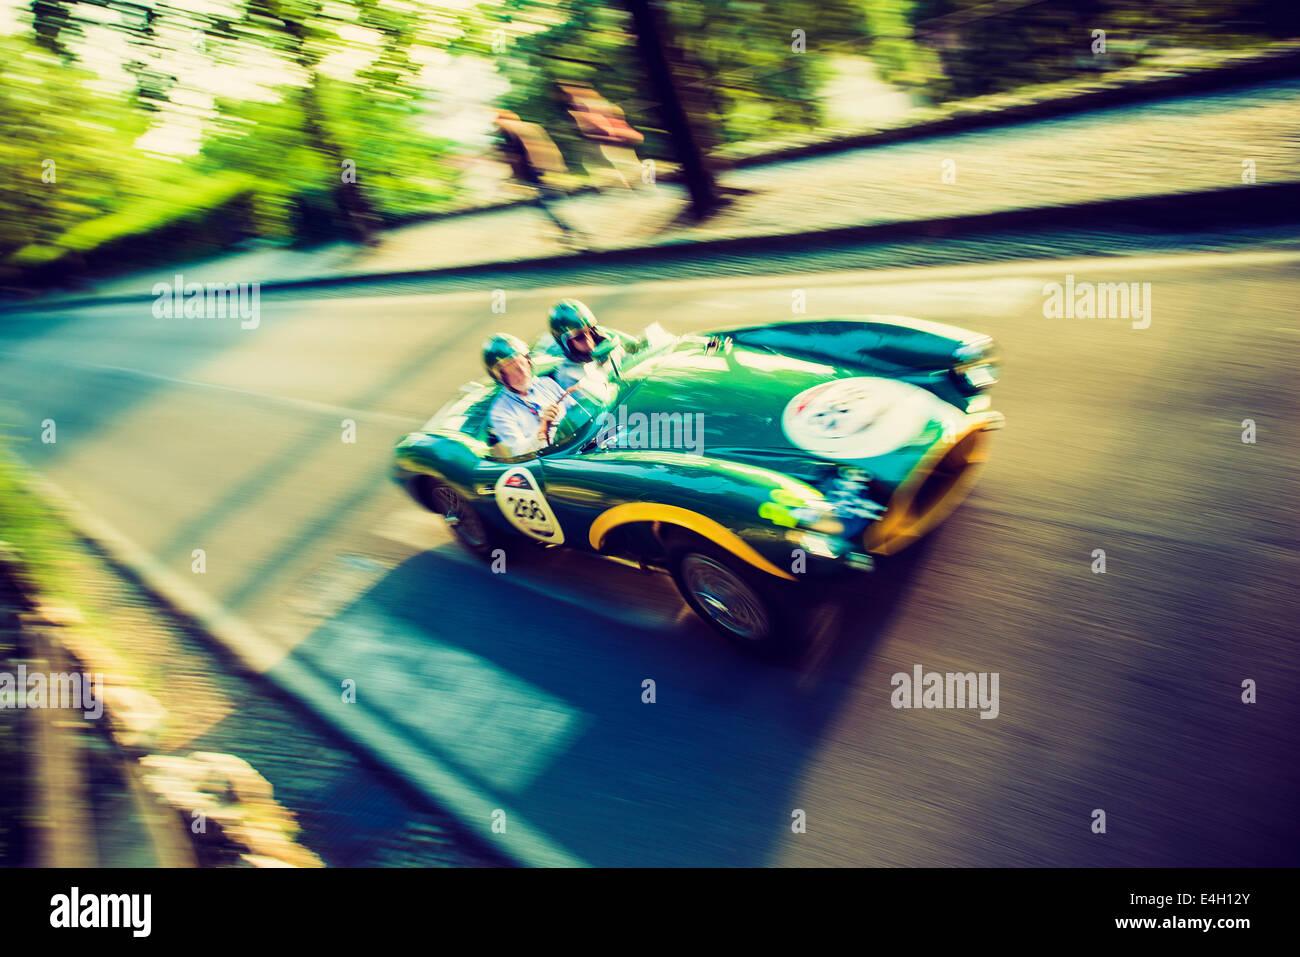 Aston Martin DB3S aus dem Jahr 1953 - Mille Miglia - Oldtimer-Rennen, Brescia, Italien 2014 Stockbild